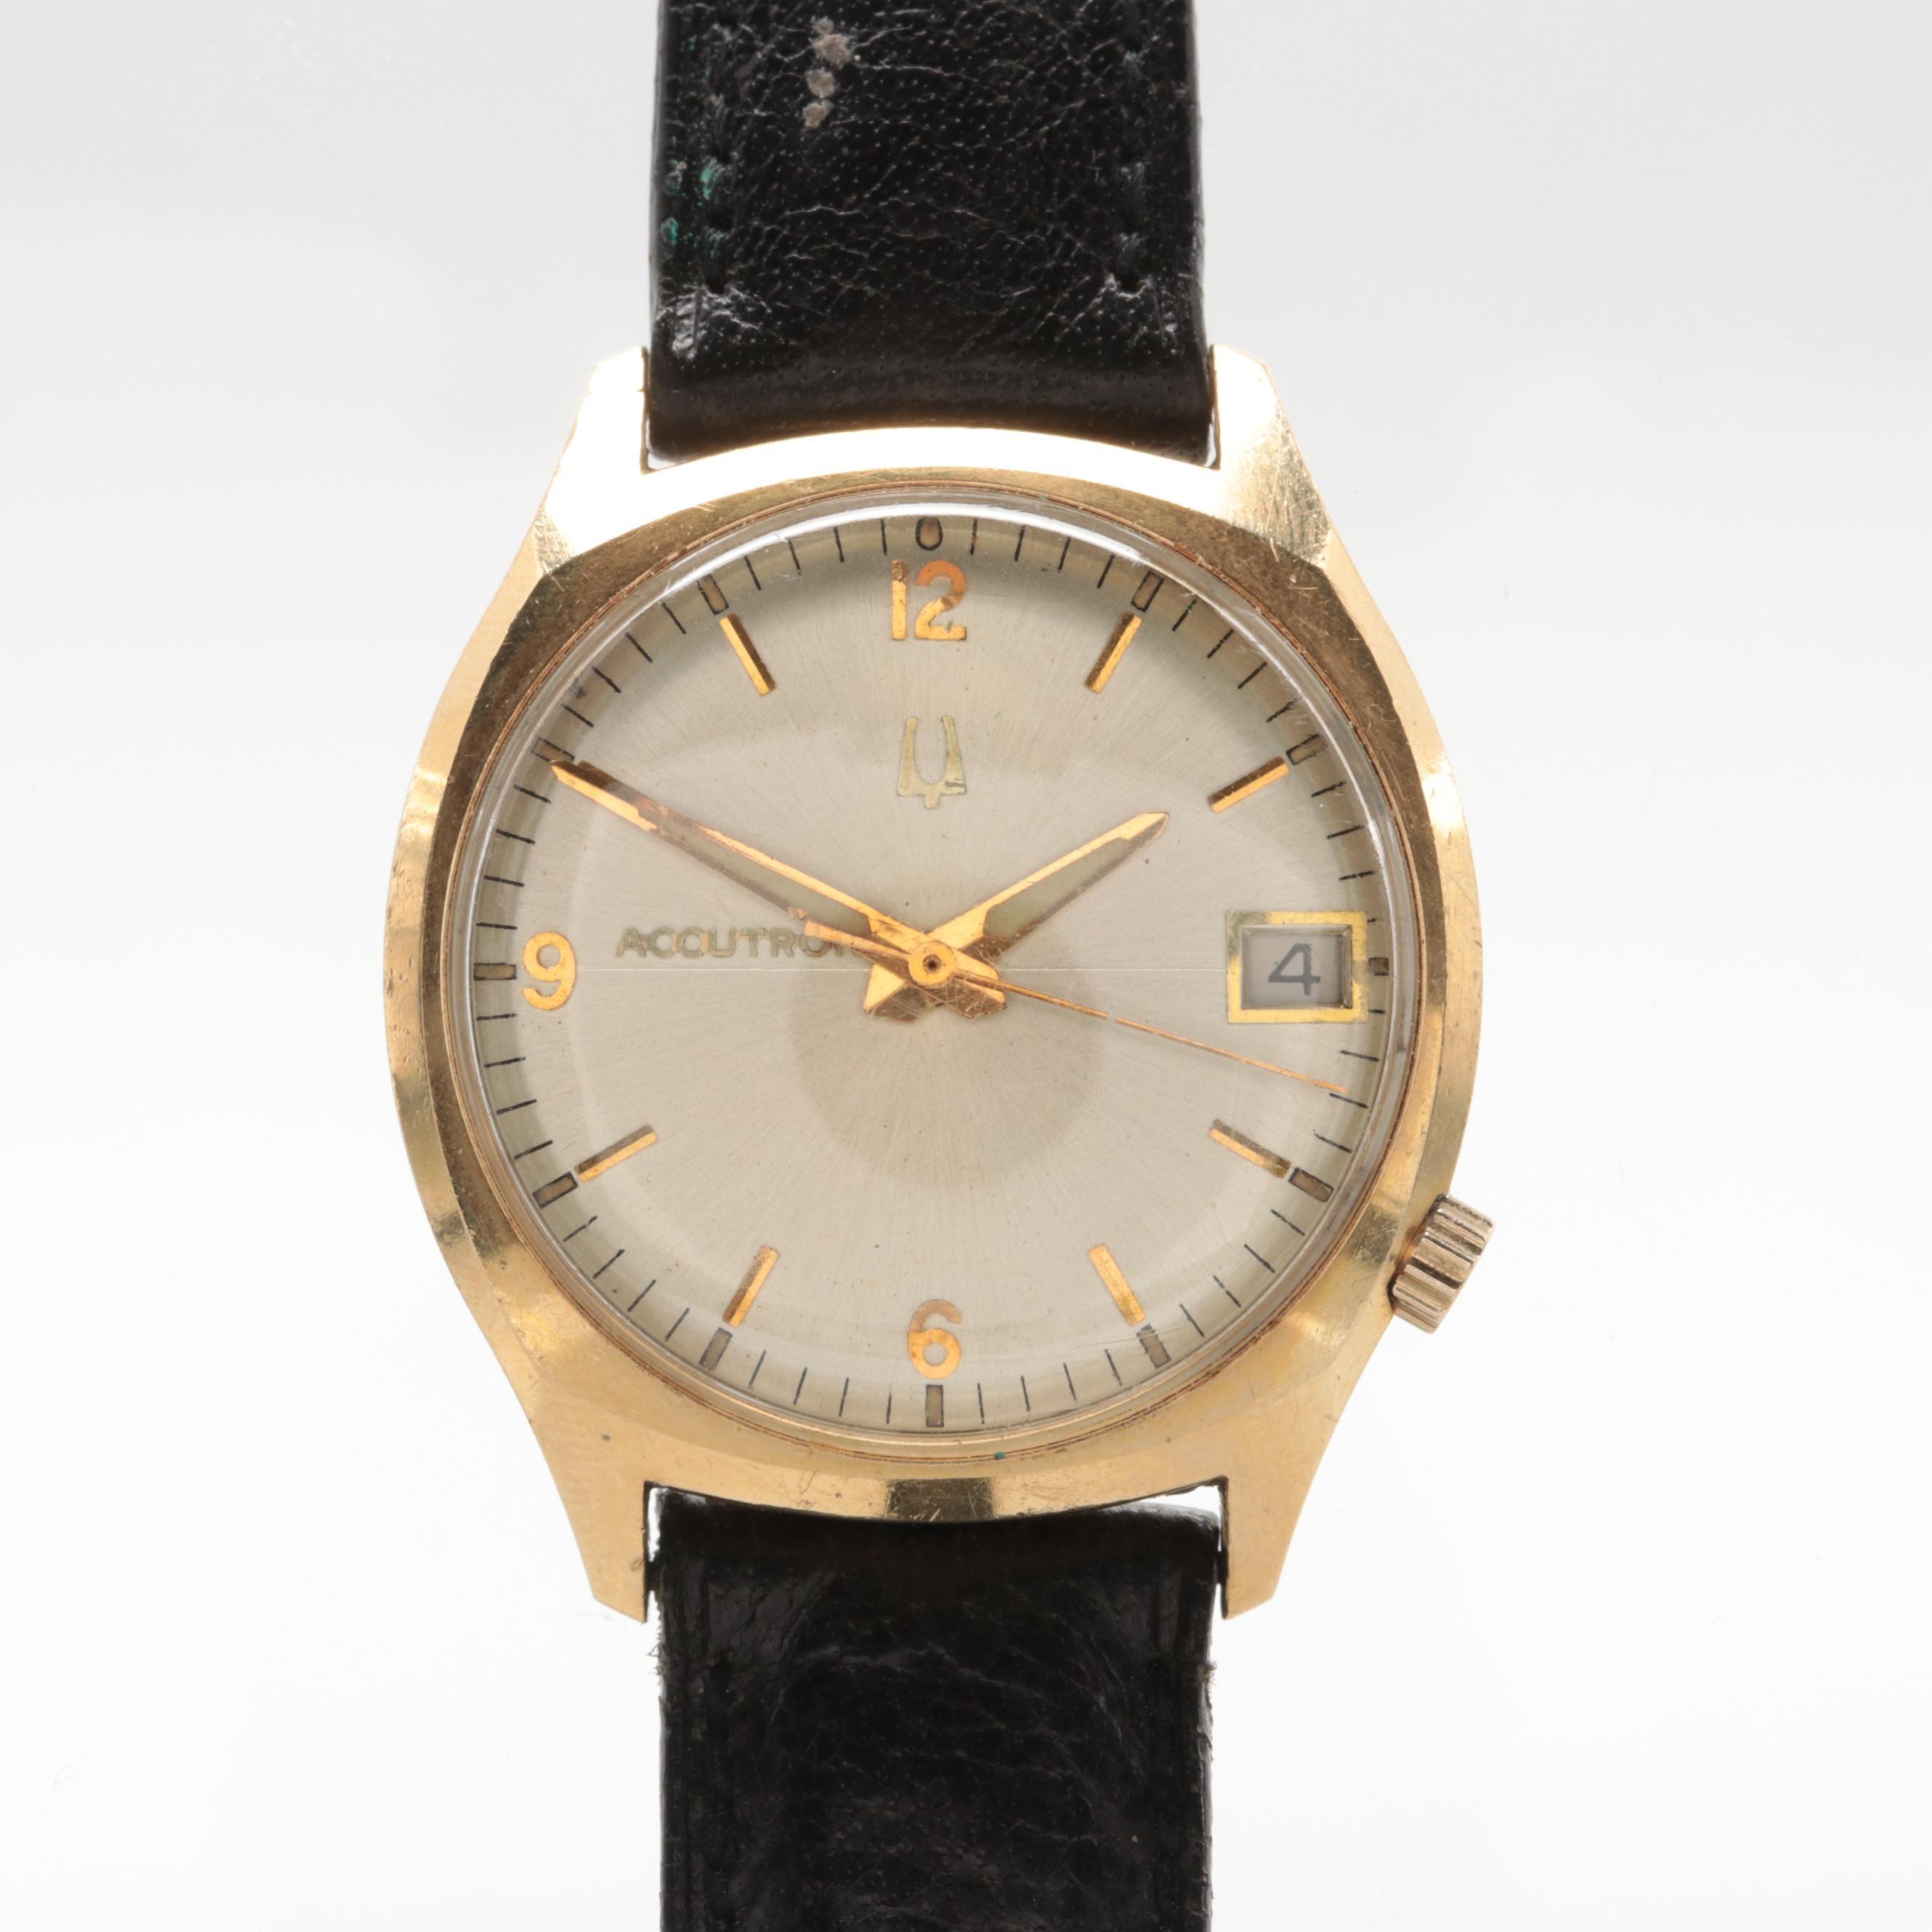 Accutron 14K Gold Filled Wristwatch